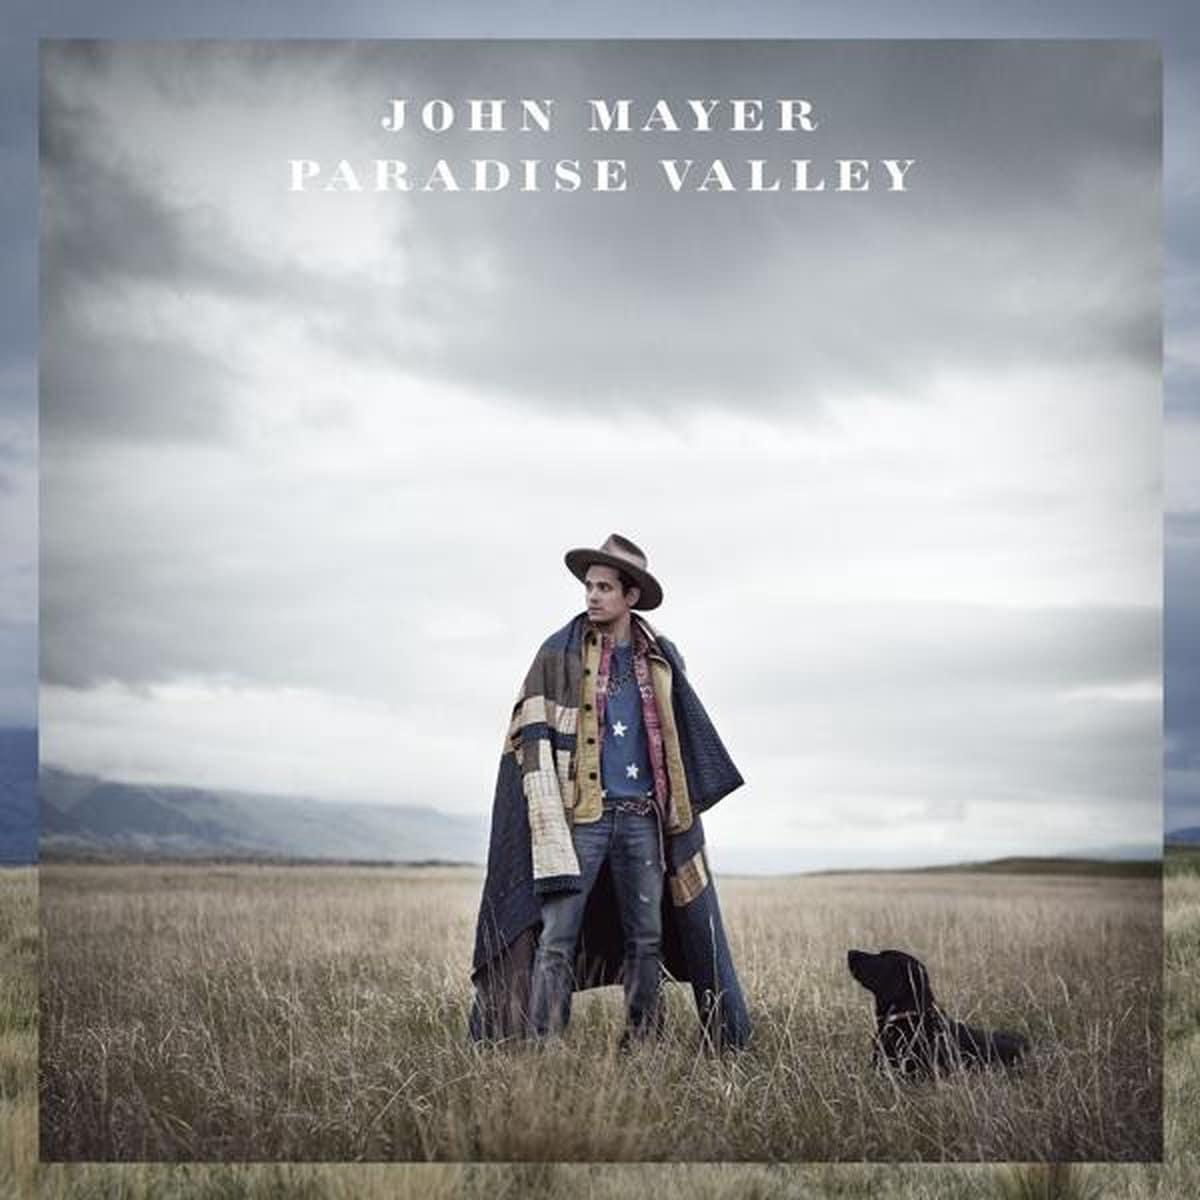 Album cover van John Mayer's Paradise valley